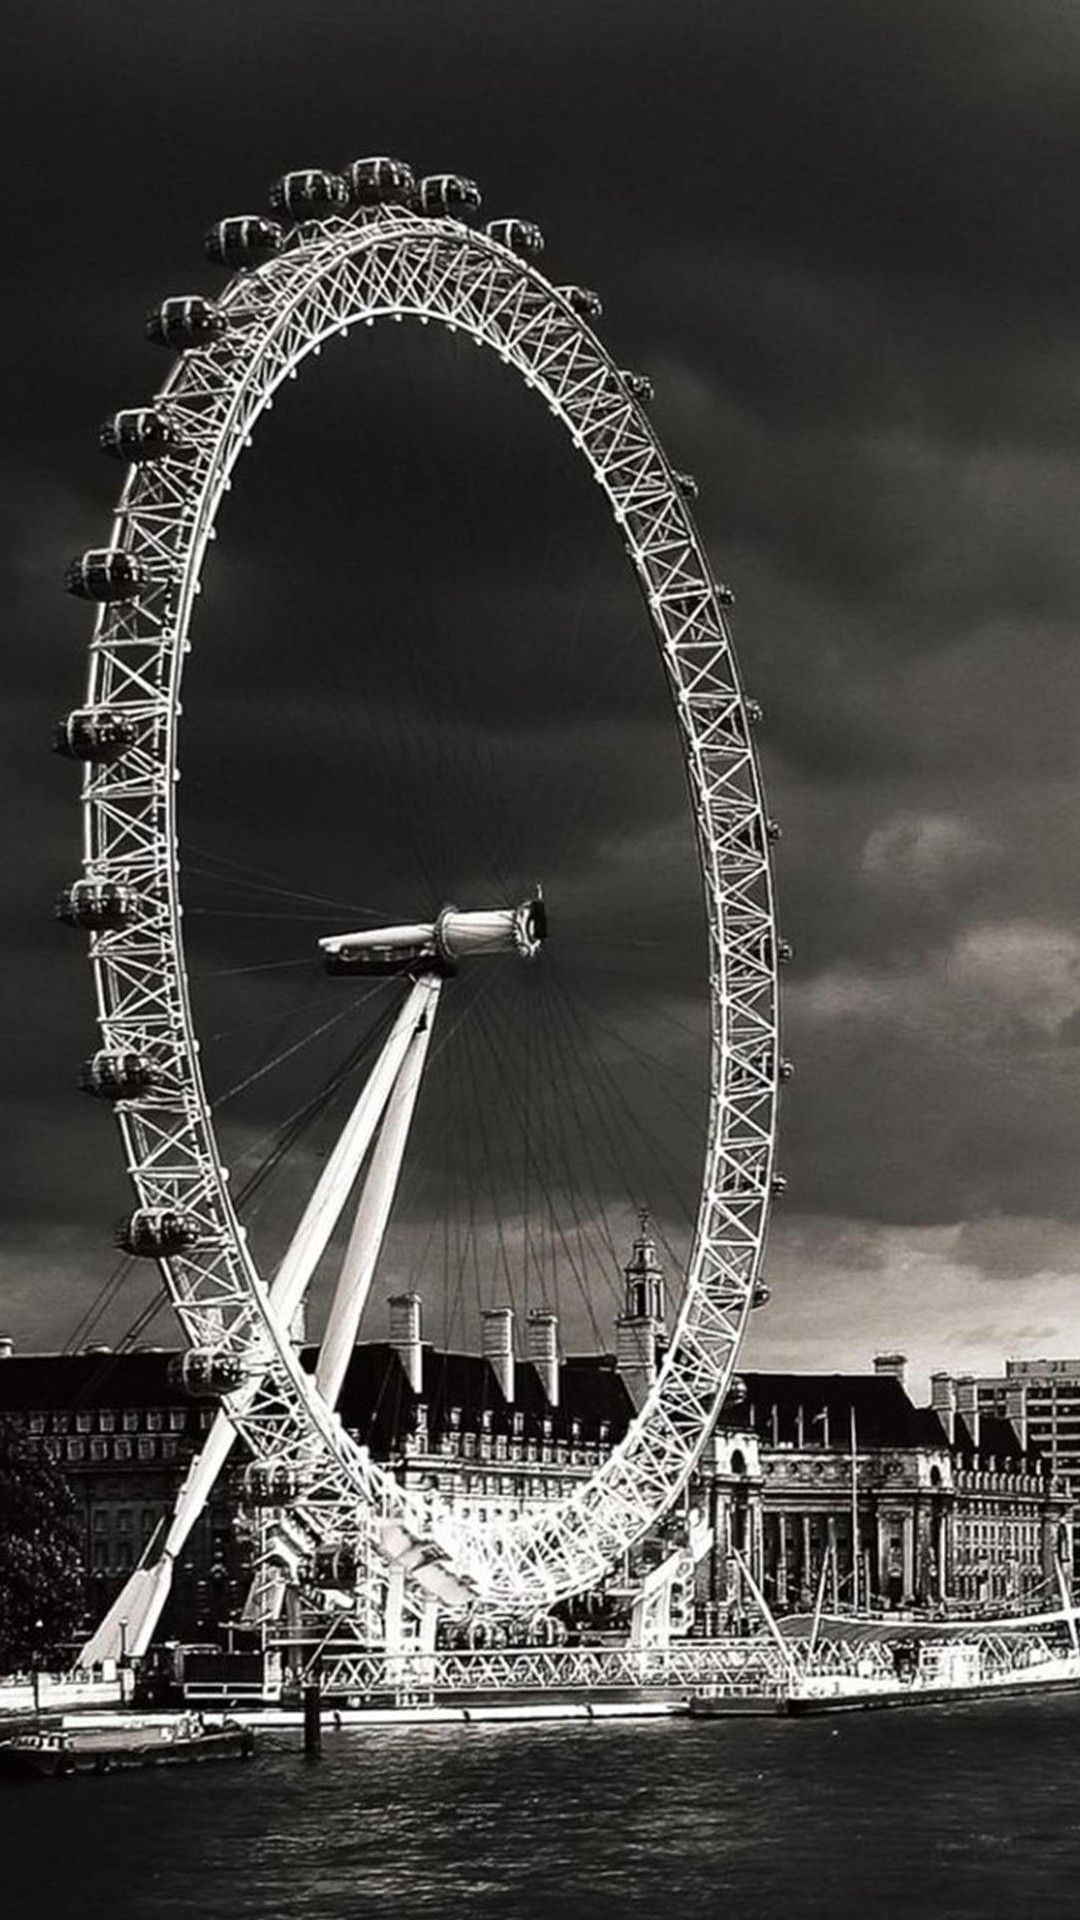 2048x2048 2048x2048 wallpaper london bridge big ben black white skyscrapers